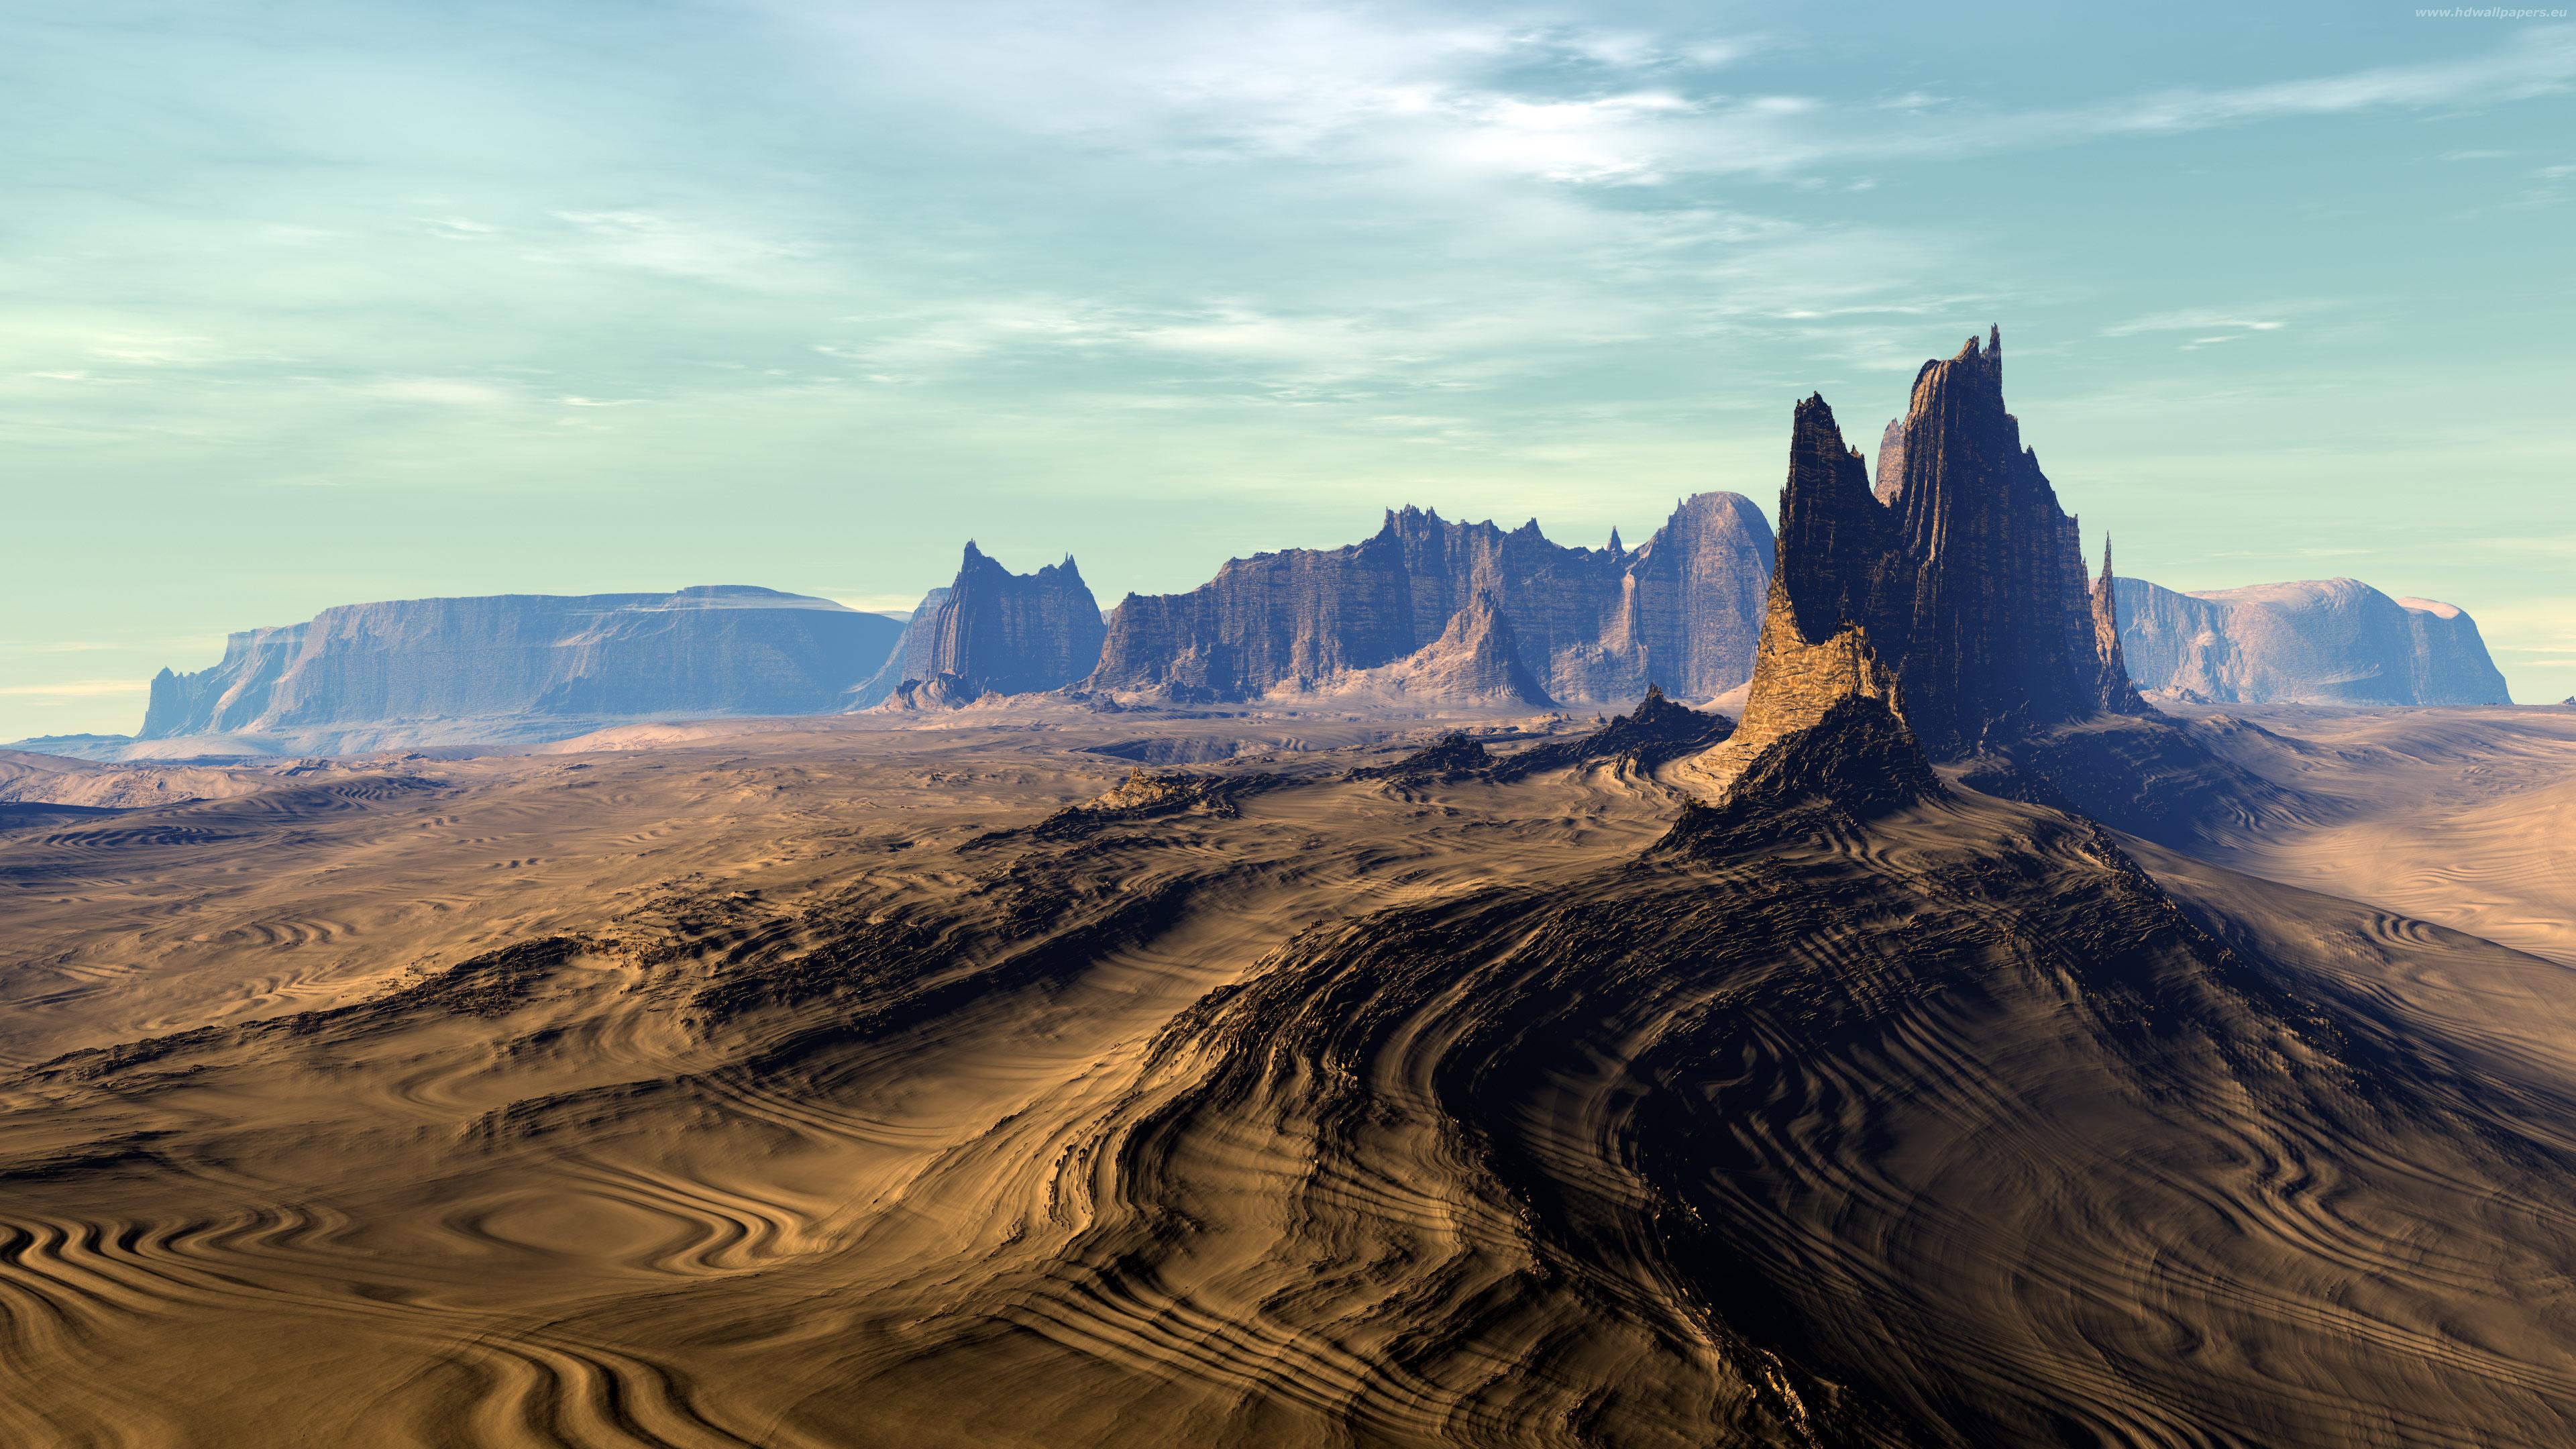 landscape 4k ultra hd wallpaper | background image | 3840x2160 | id